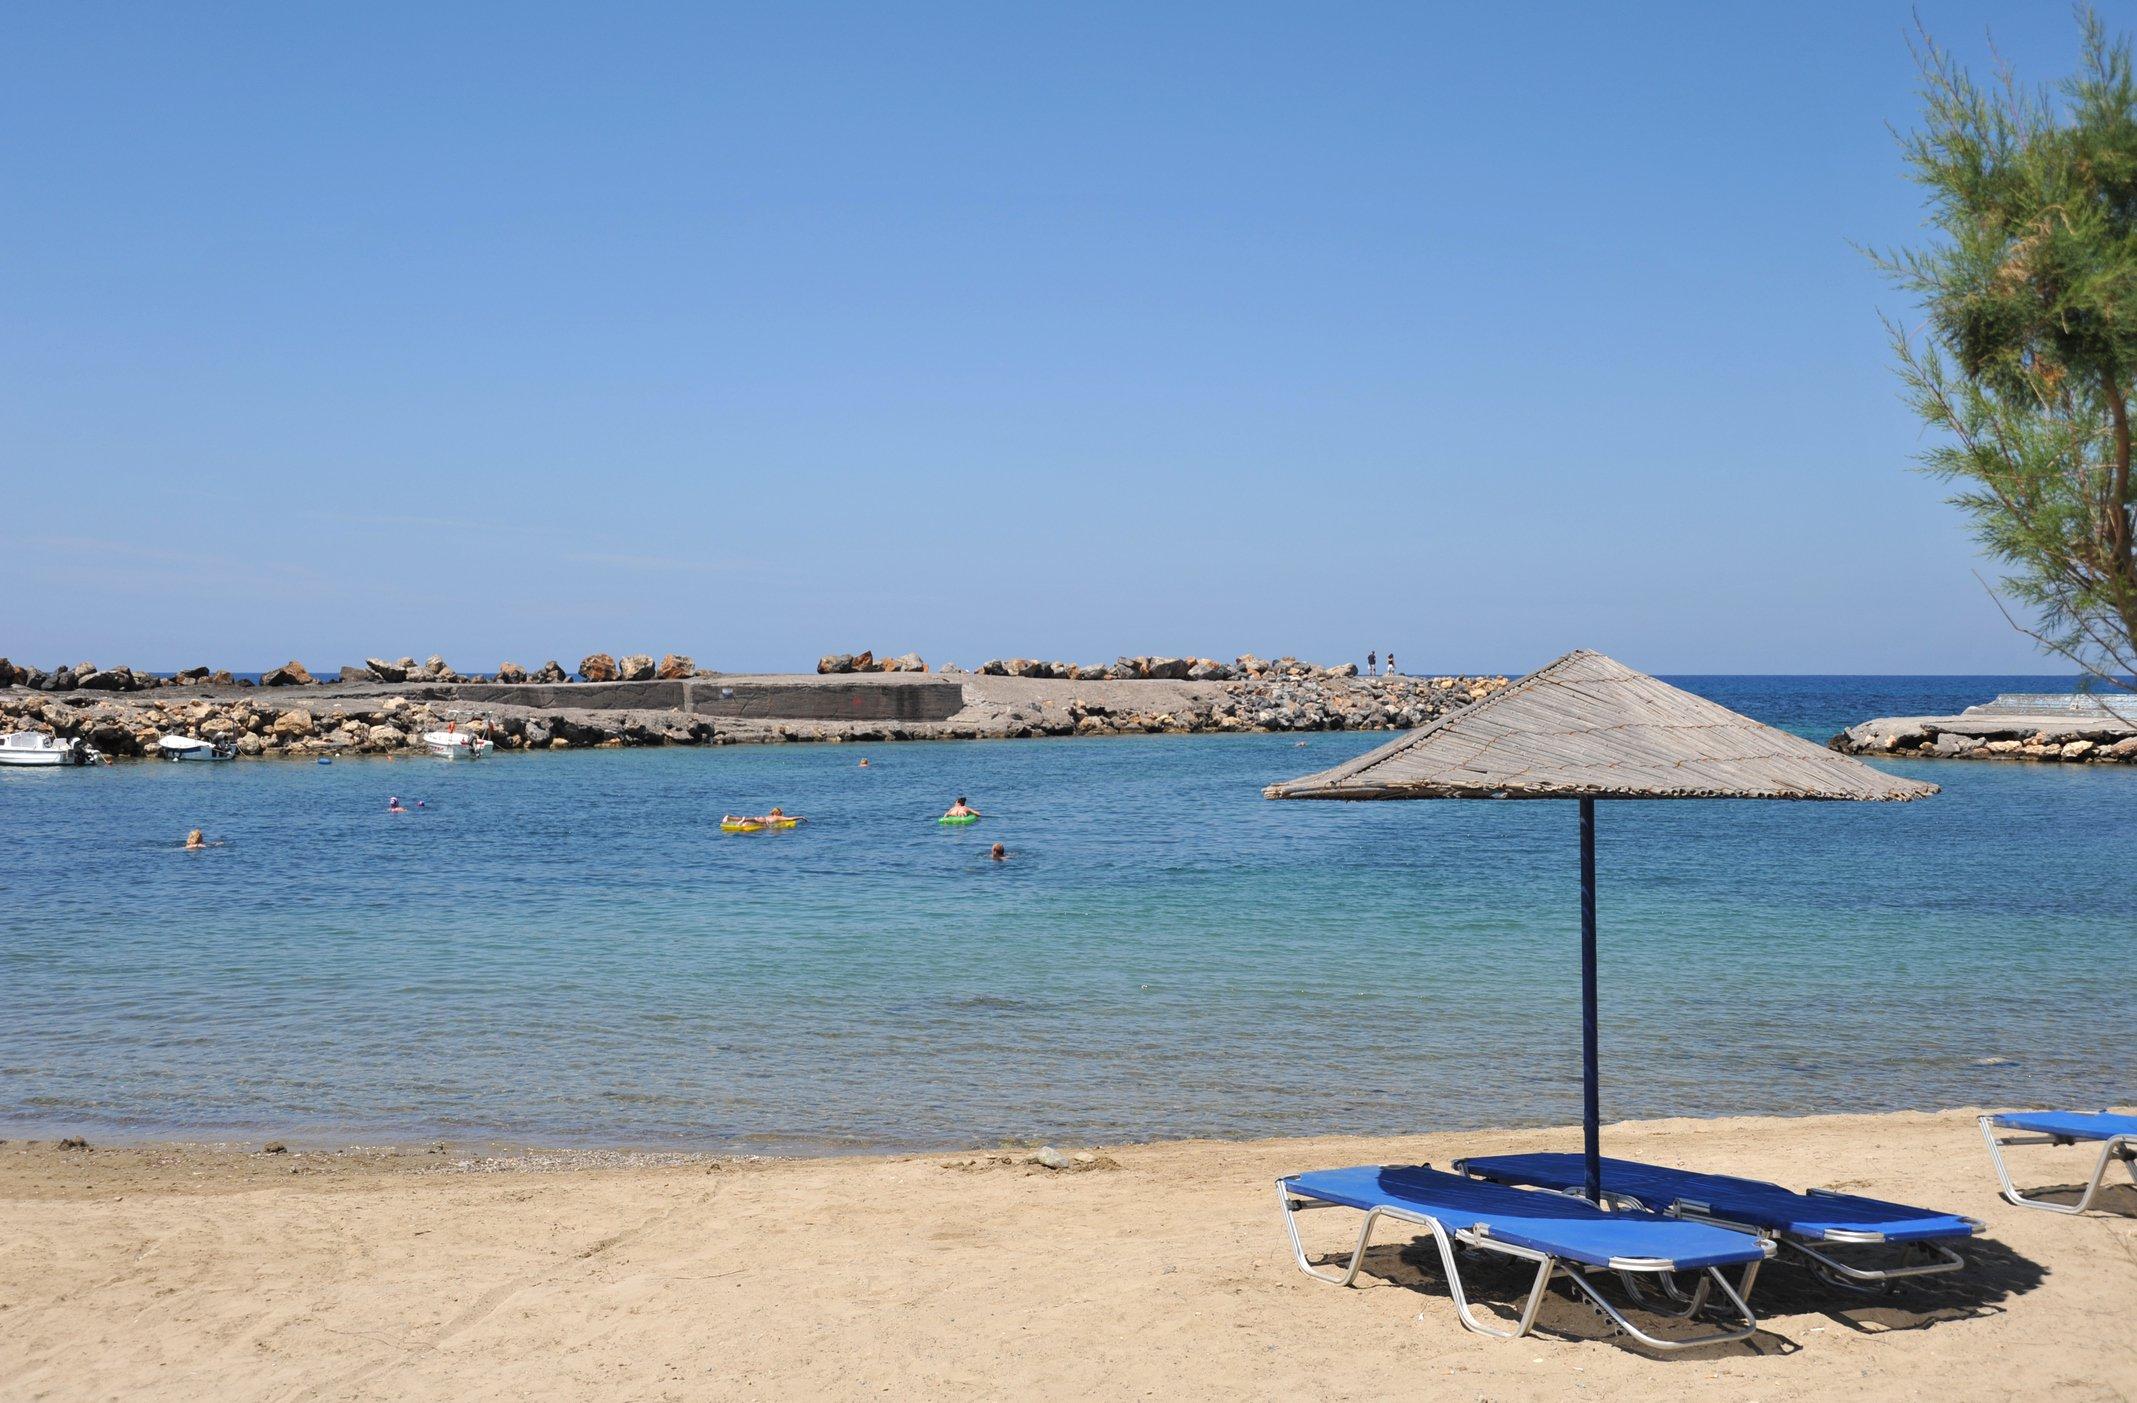 Crete: 4 Star All Inclusive Holiday to Award Winning Hotel w/Kids Stay FREE